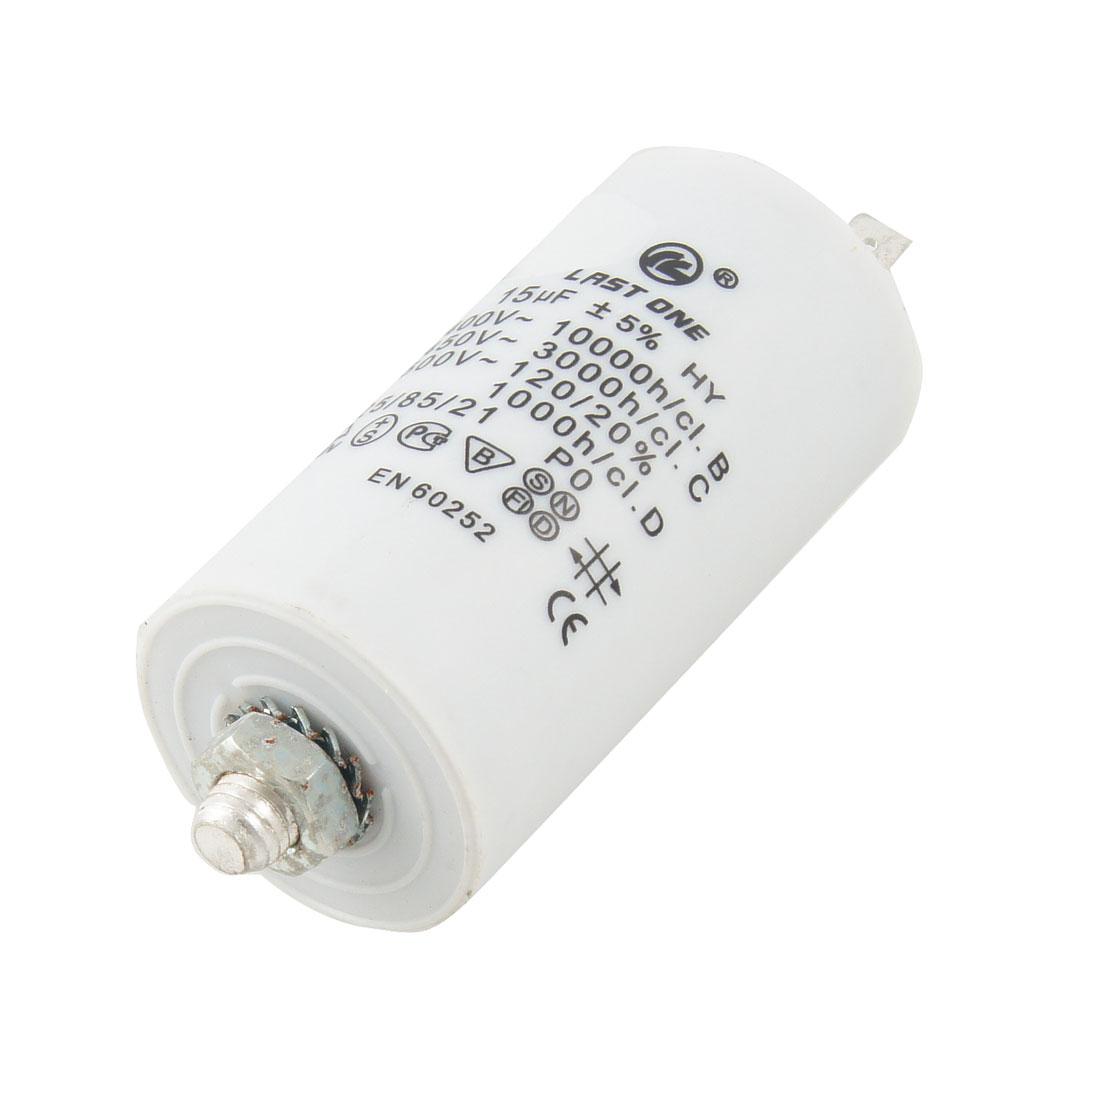 AC 450V 18uF 8mm Thread Polypropylene Film Capacitor for Washing Machine